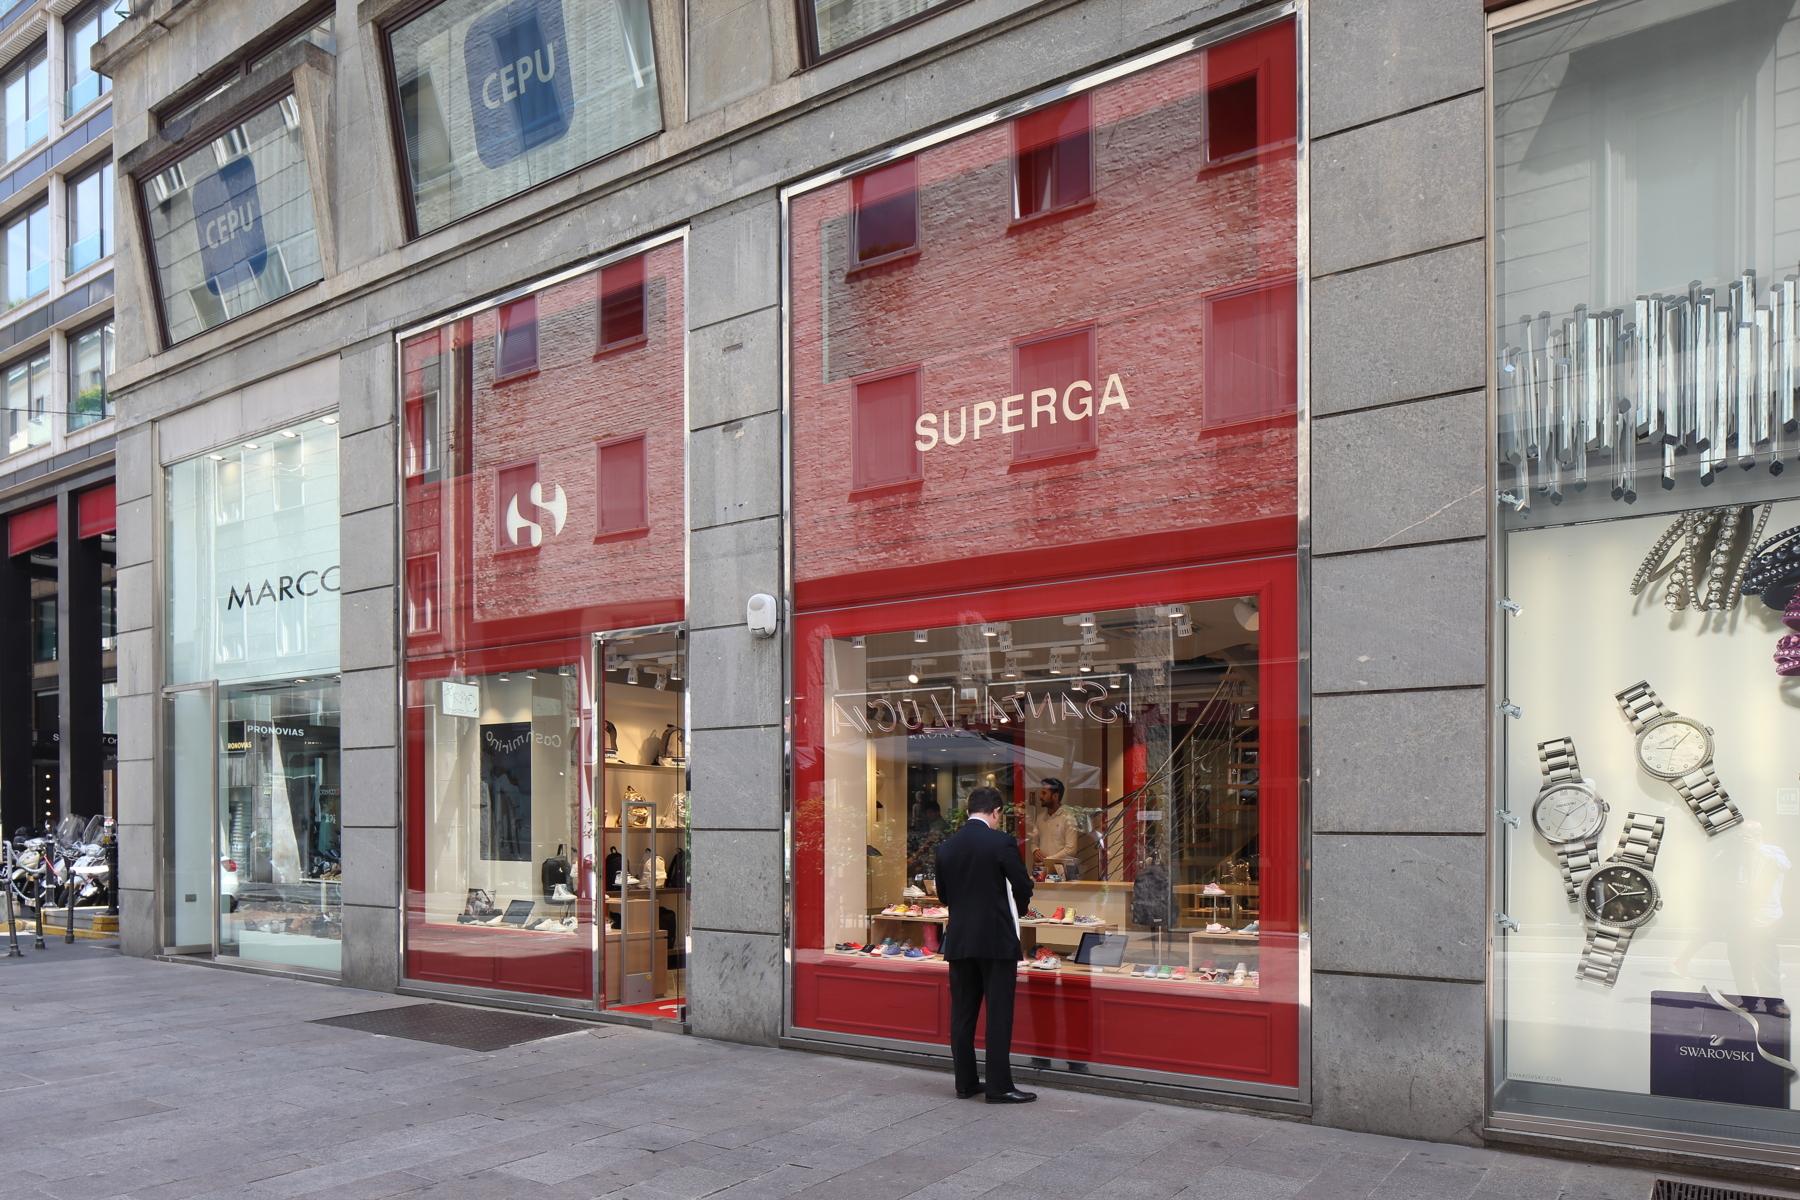 Negozio Superga Milano | Ceramiche Caesar